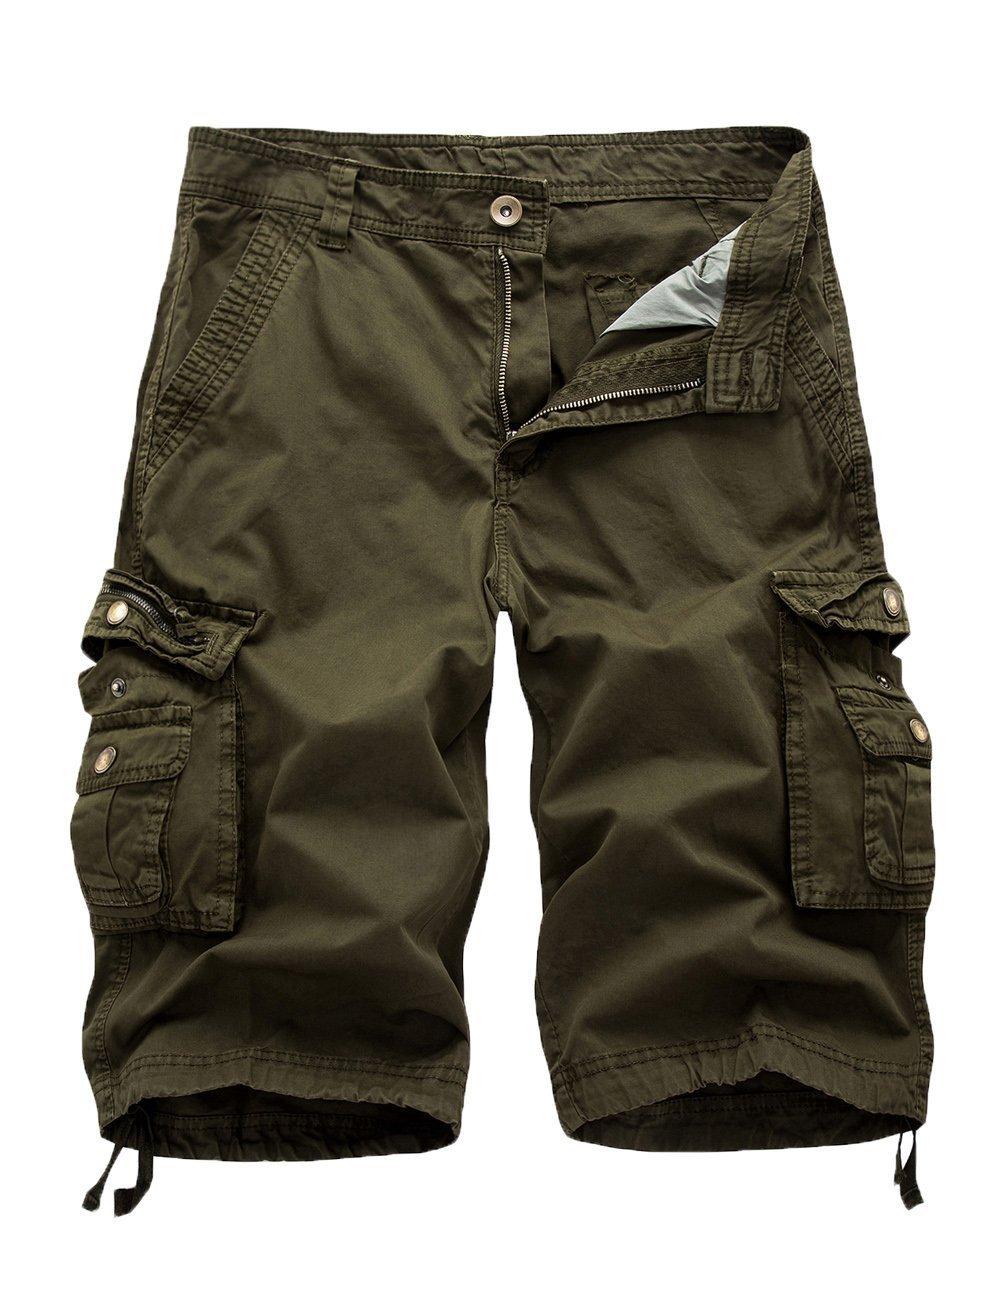 Women's Cotton Loose Fit Zipper Multi-Pockets Twill Bermuda Drawstring Cargo Shorts Green US 12